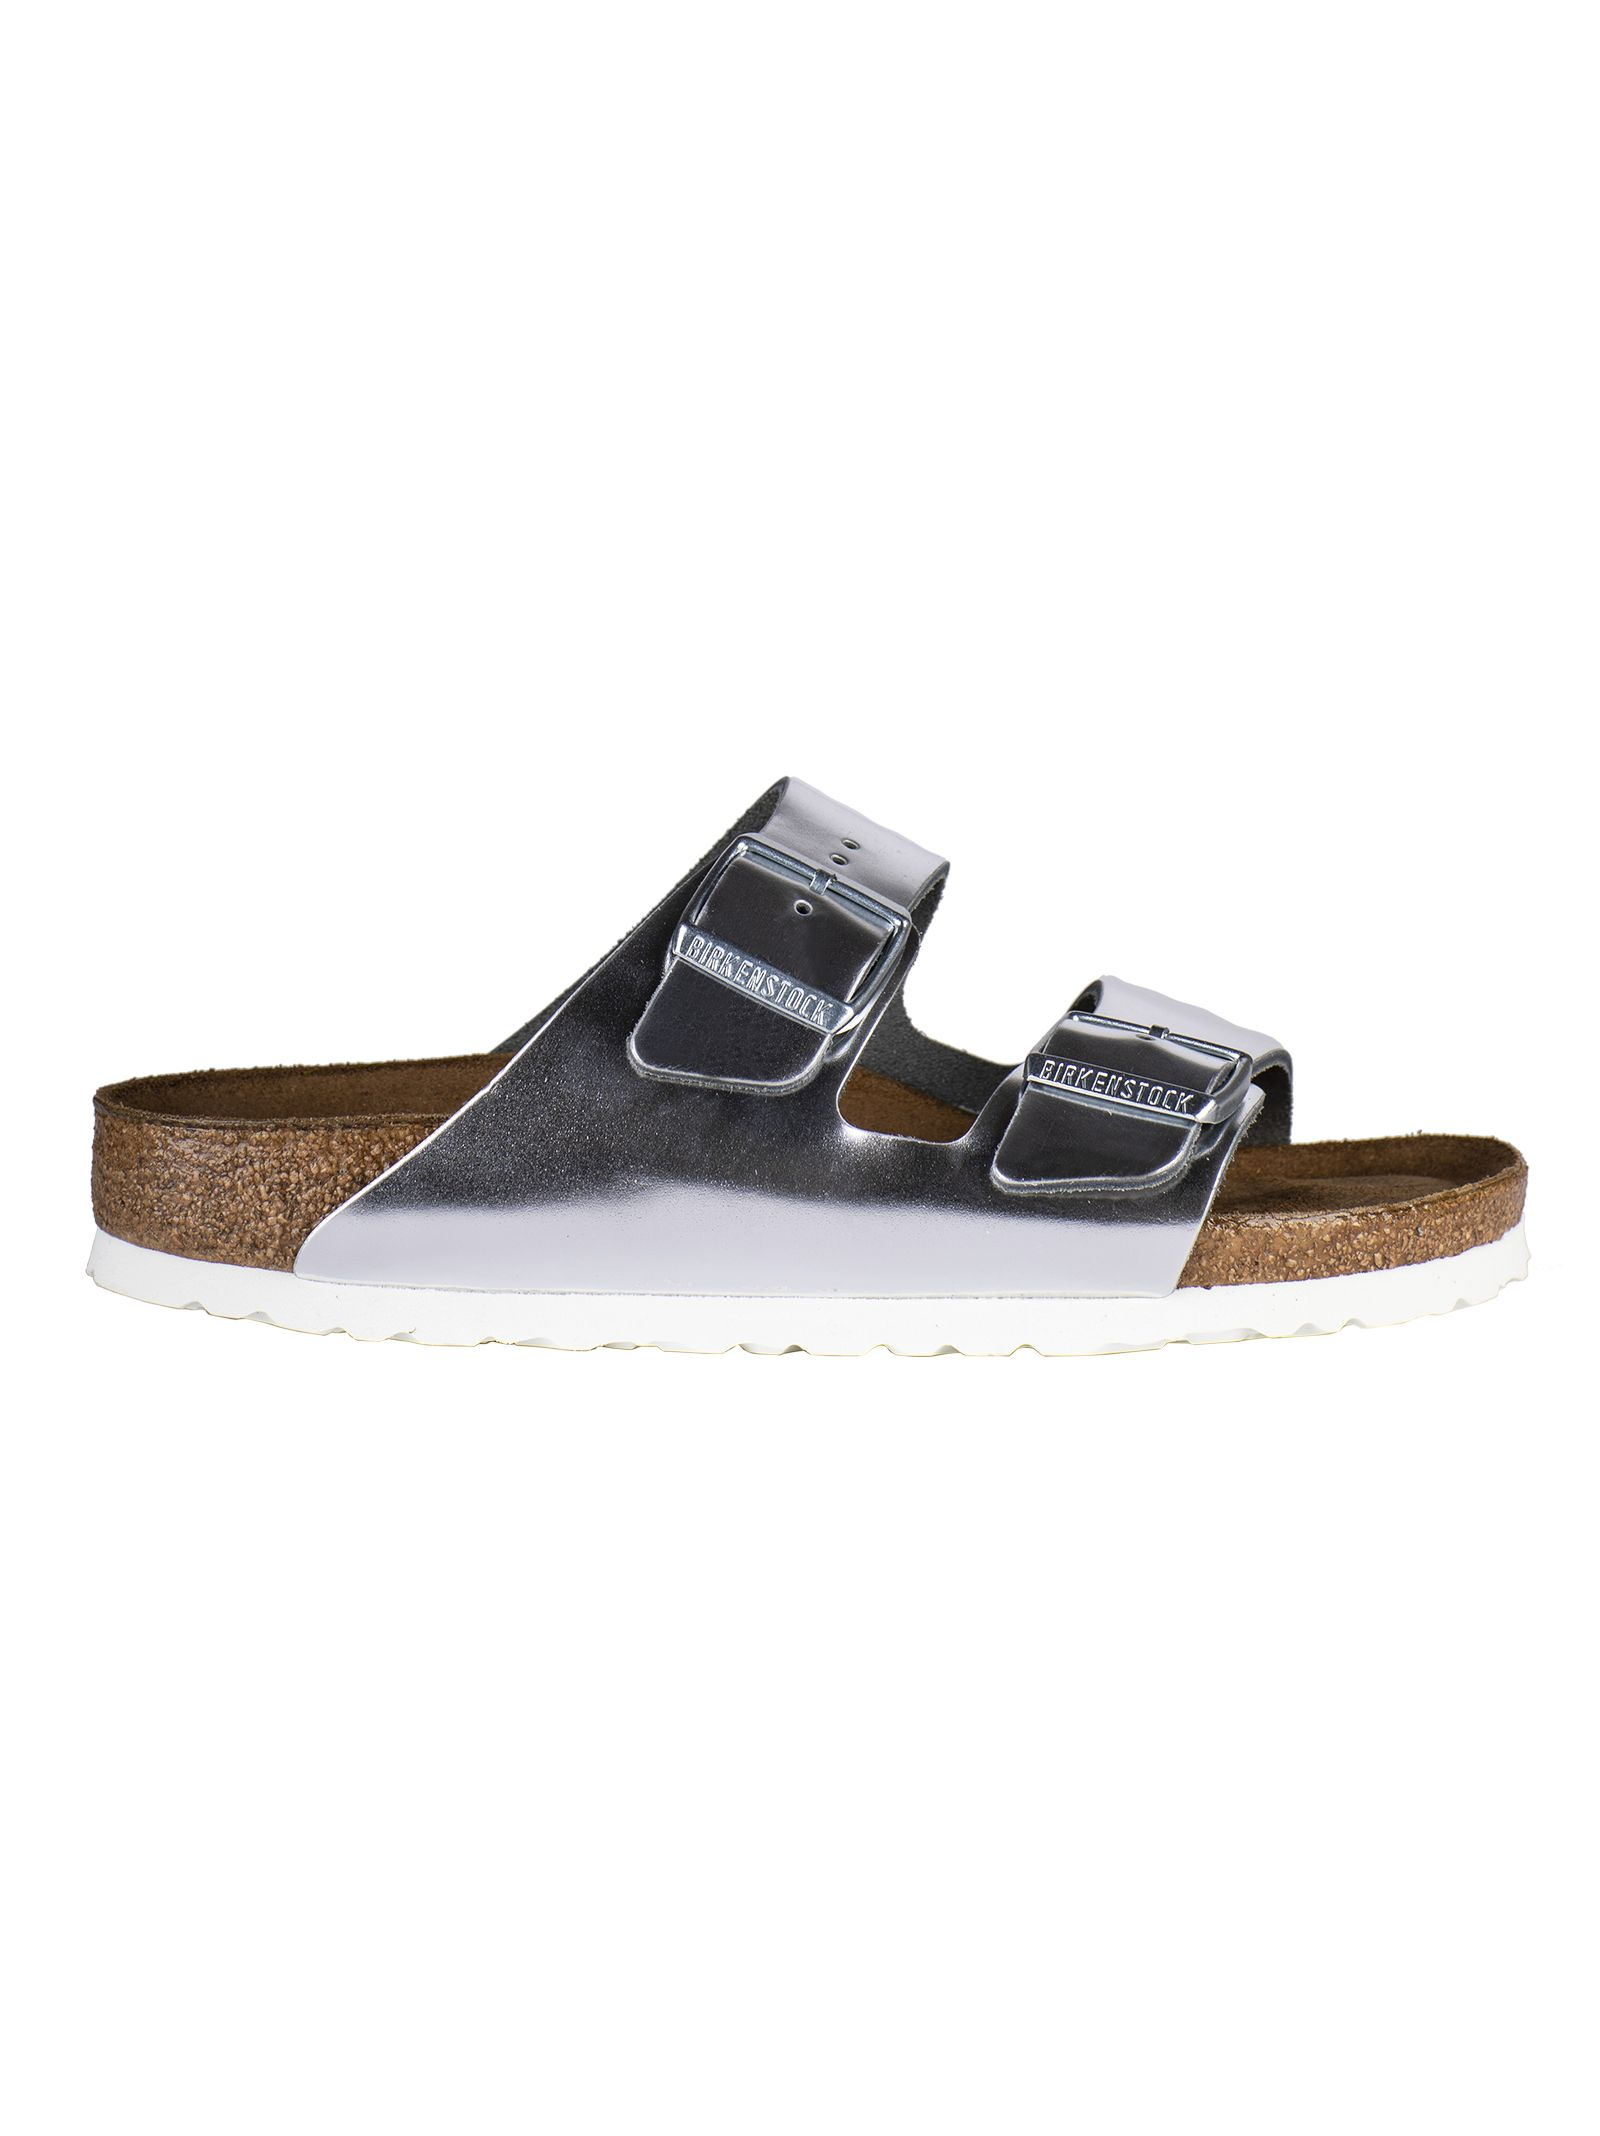 7fec74e556367a Birkenstock Birkenstock Double Strap Sandals - Silver - 10840809 ...